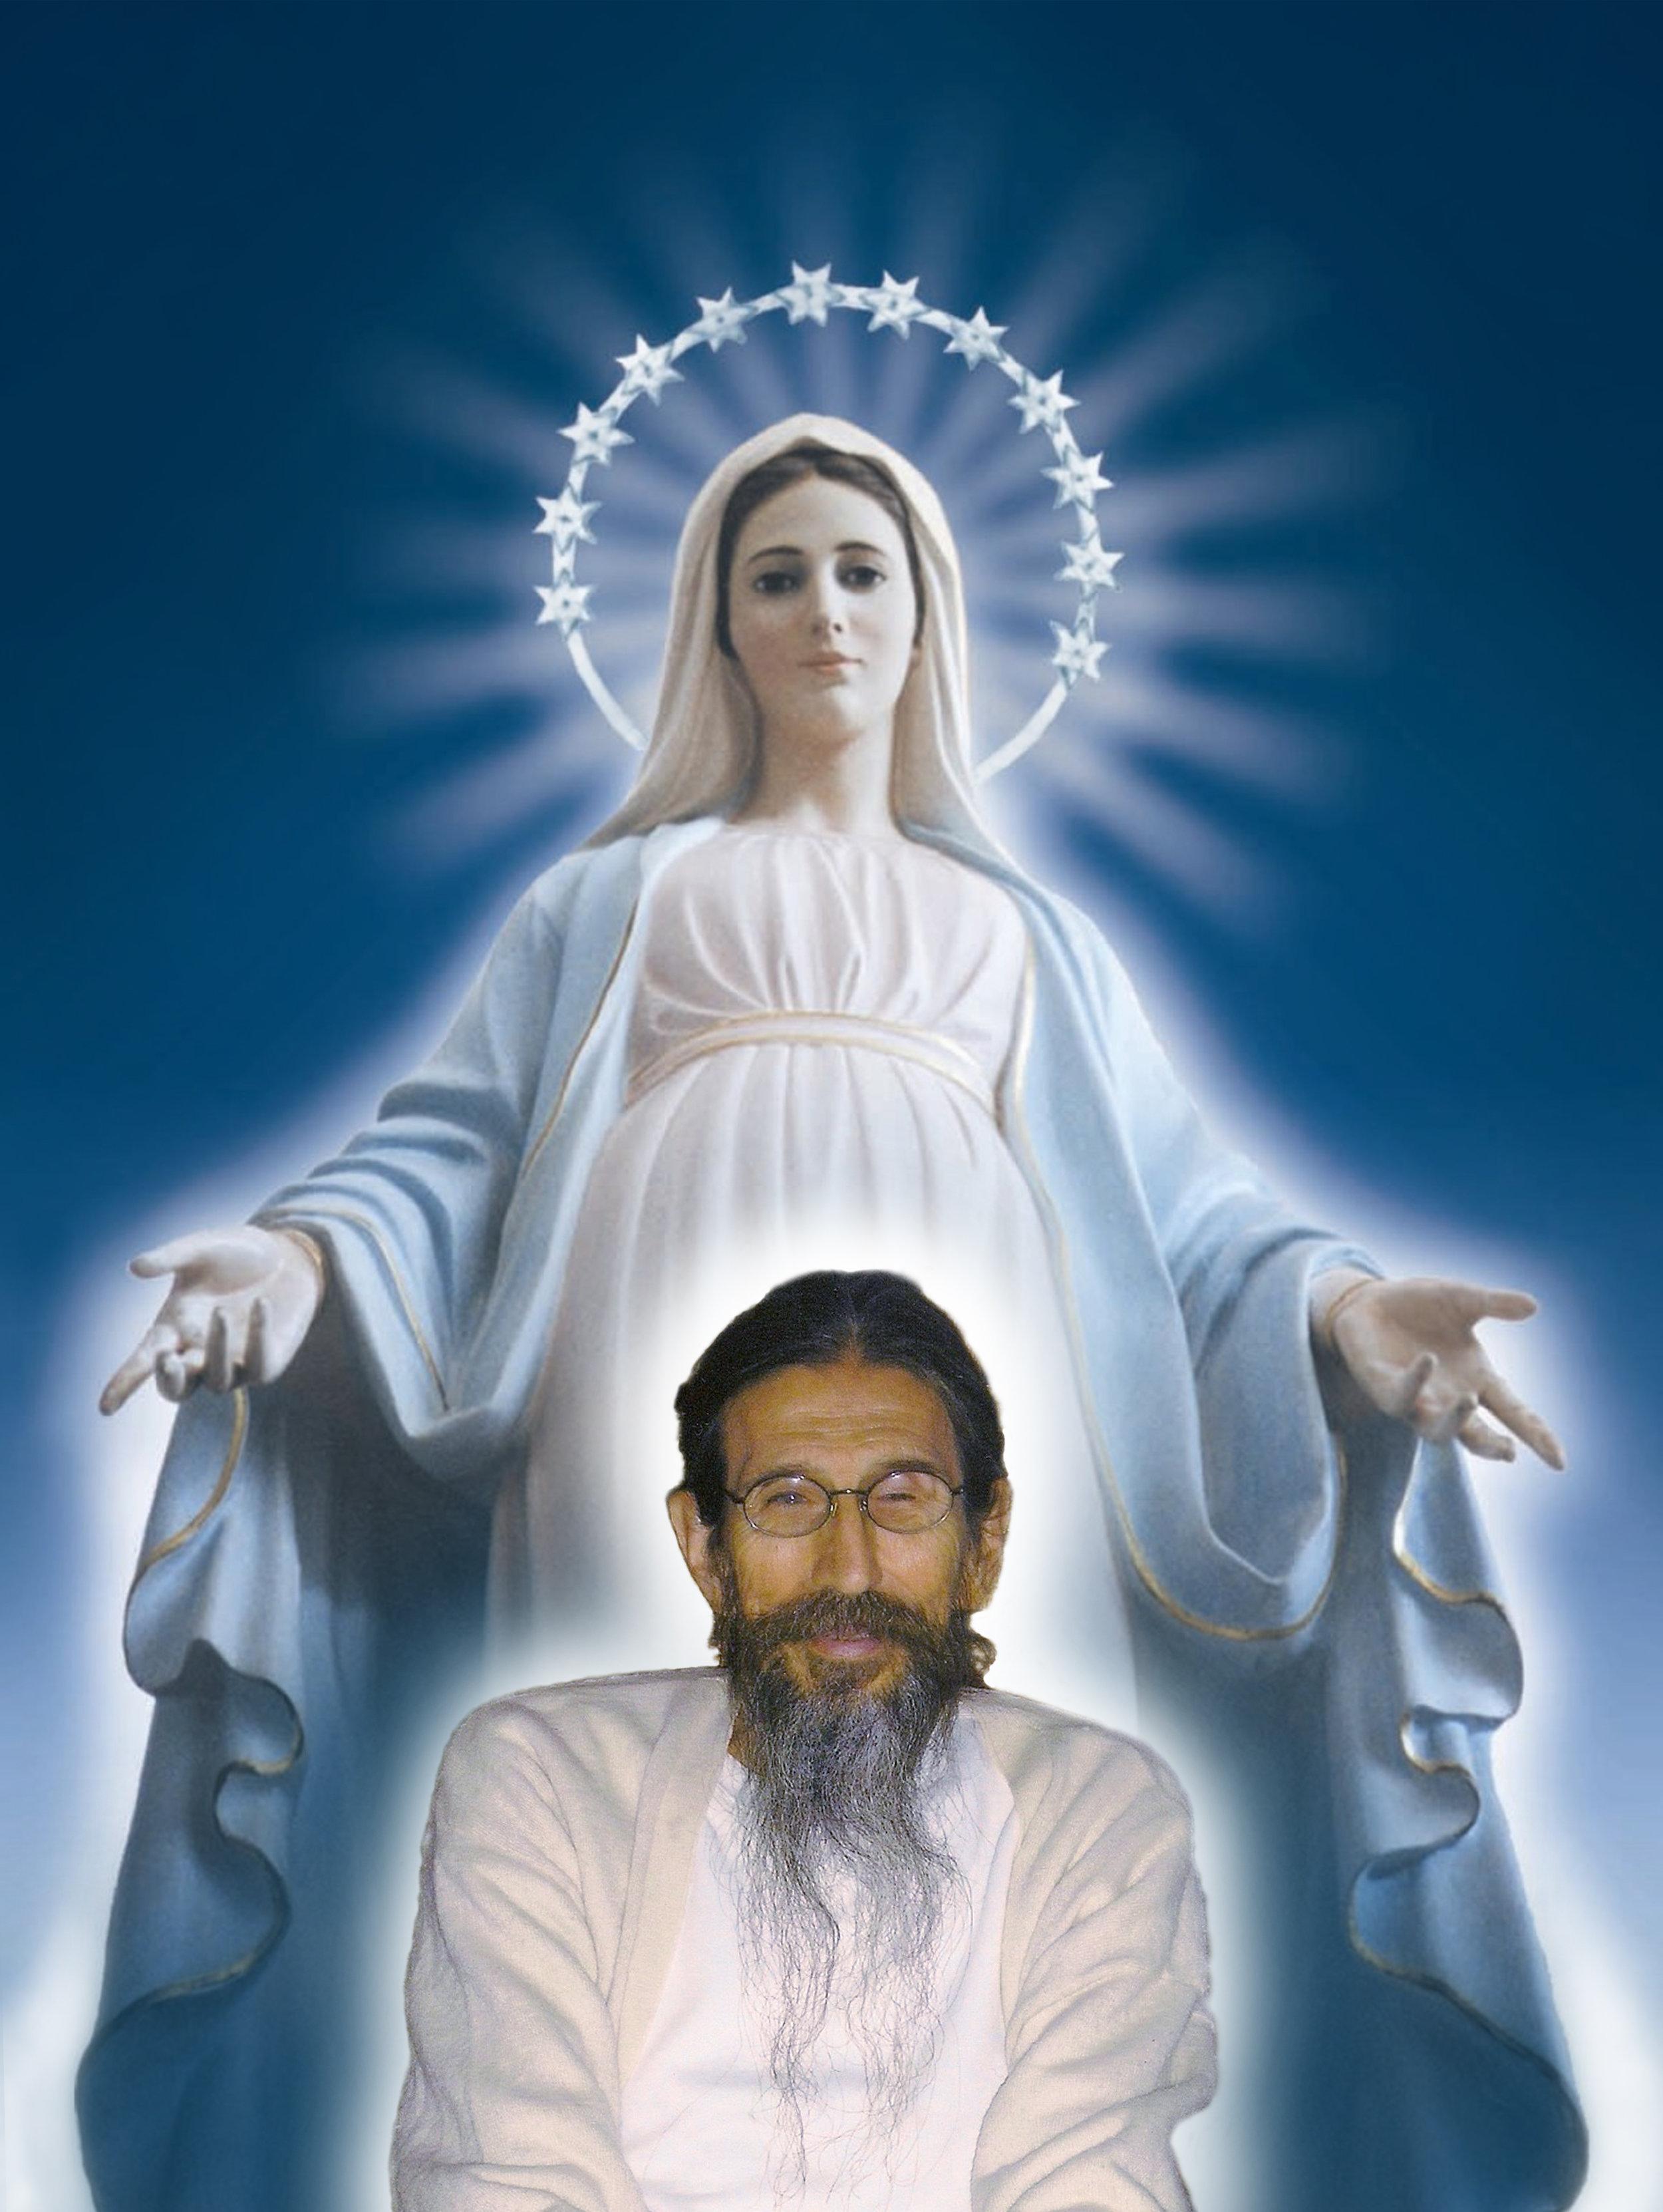 Guruji and the Virgin-1.jpg